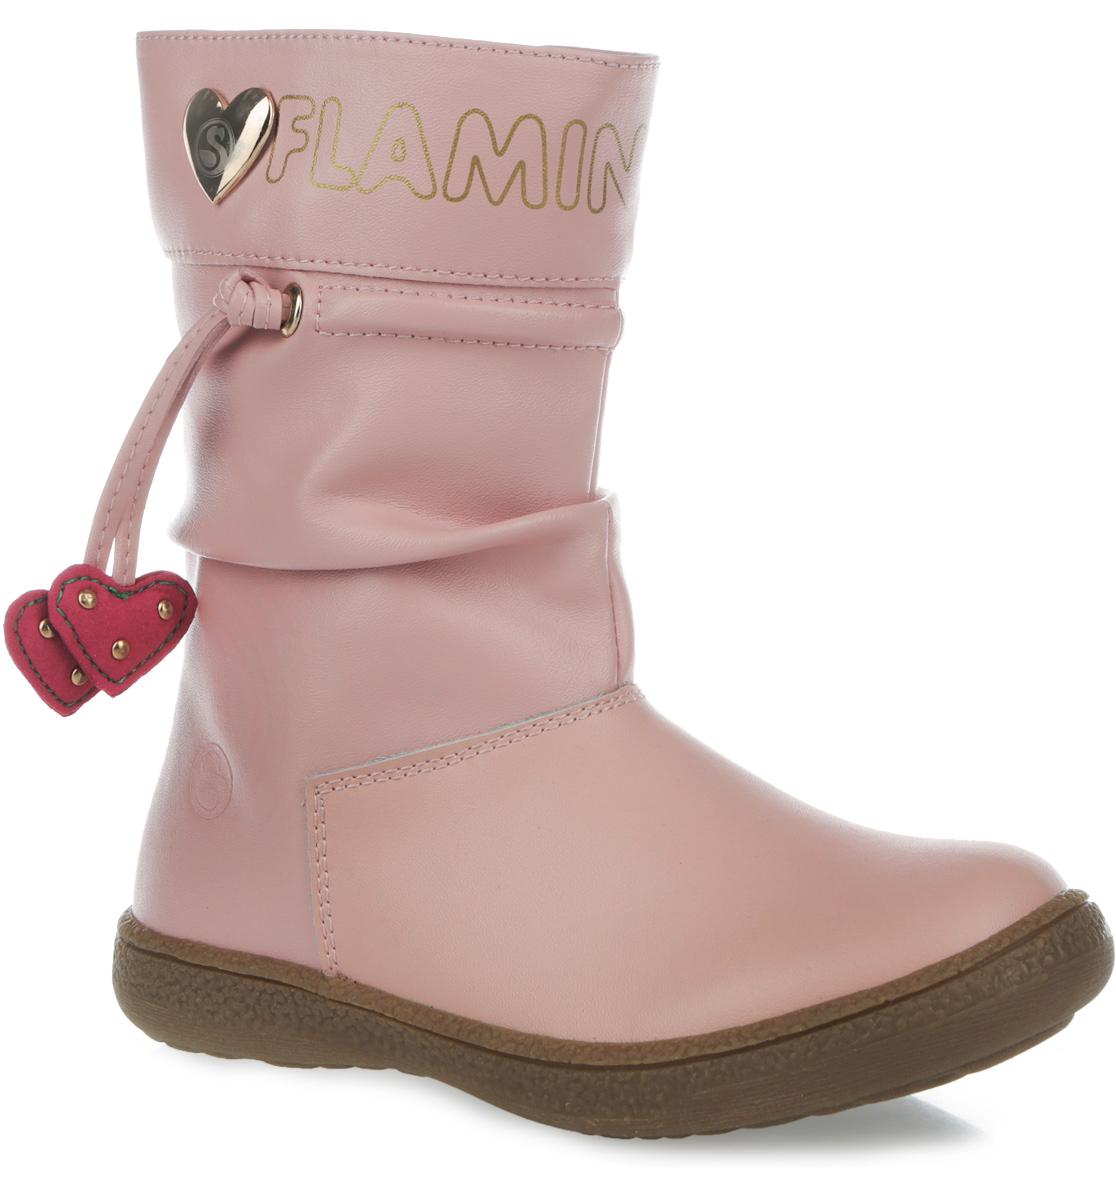 ������ ��� �������. 52-CC31 - Flamingo52-CC318�������������� ������ �� Flamingo �������� �� ���� ��������� �������! ������ ����������� �� ����������� � ������������� ����. ����� ��������� �� �������� ��������� ������ � ������������ ��������� � ���� ������, ����������� �� �������. ����� ������� �������� ����� ������������� ��������, ������������ �� ������ ������������ ����������. �������� ������������ �������������� ����������. ������ ������������� �� ������� ��������-������, ������������� �� ����� �� ������� ������. ��������� � �������, ����������� �� ������������� �����, �������� ����� � �����. ������� � ����������� � ���� ������������� ������� ����������� ��������� ��������� �� ����� �����������. �������� � ������� ������ ������ ��������� ����� � ��������� ������ �������.